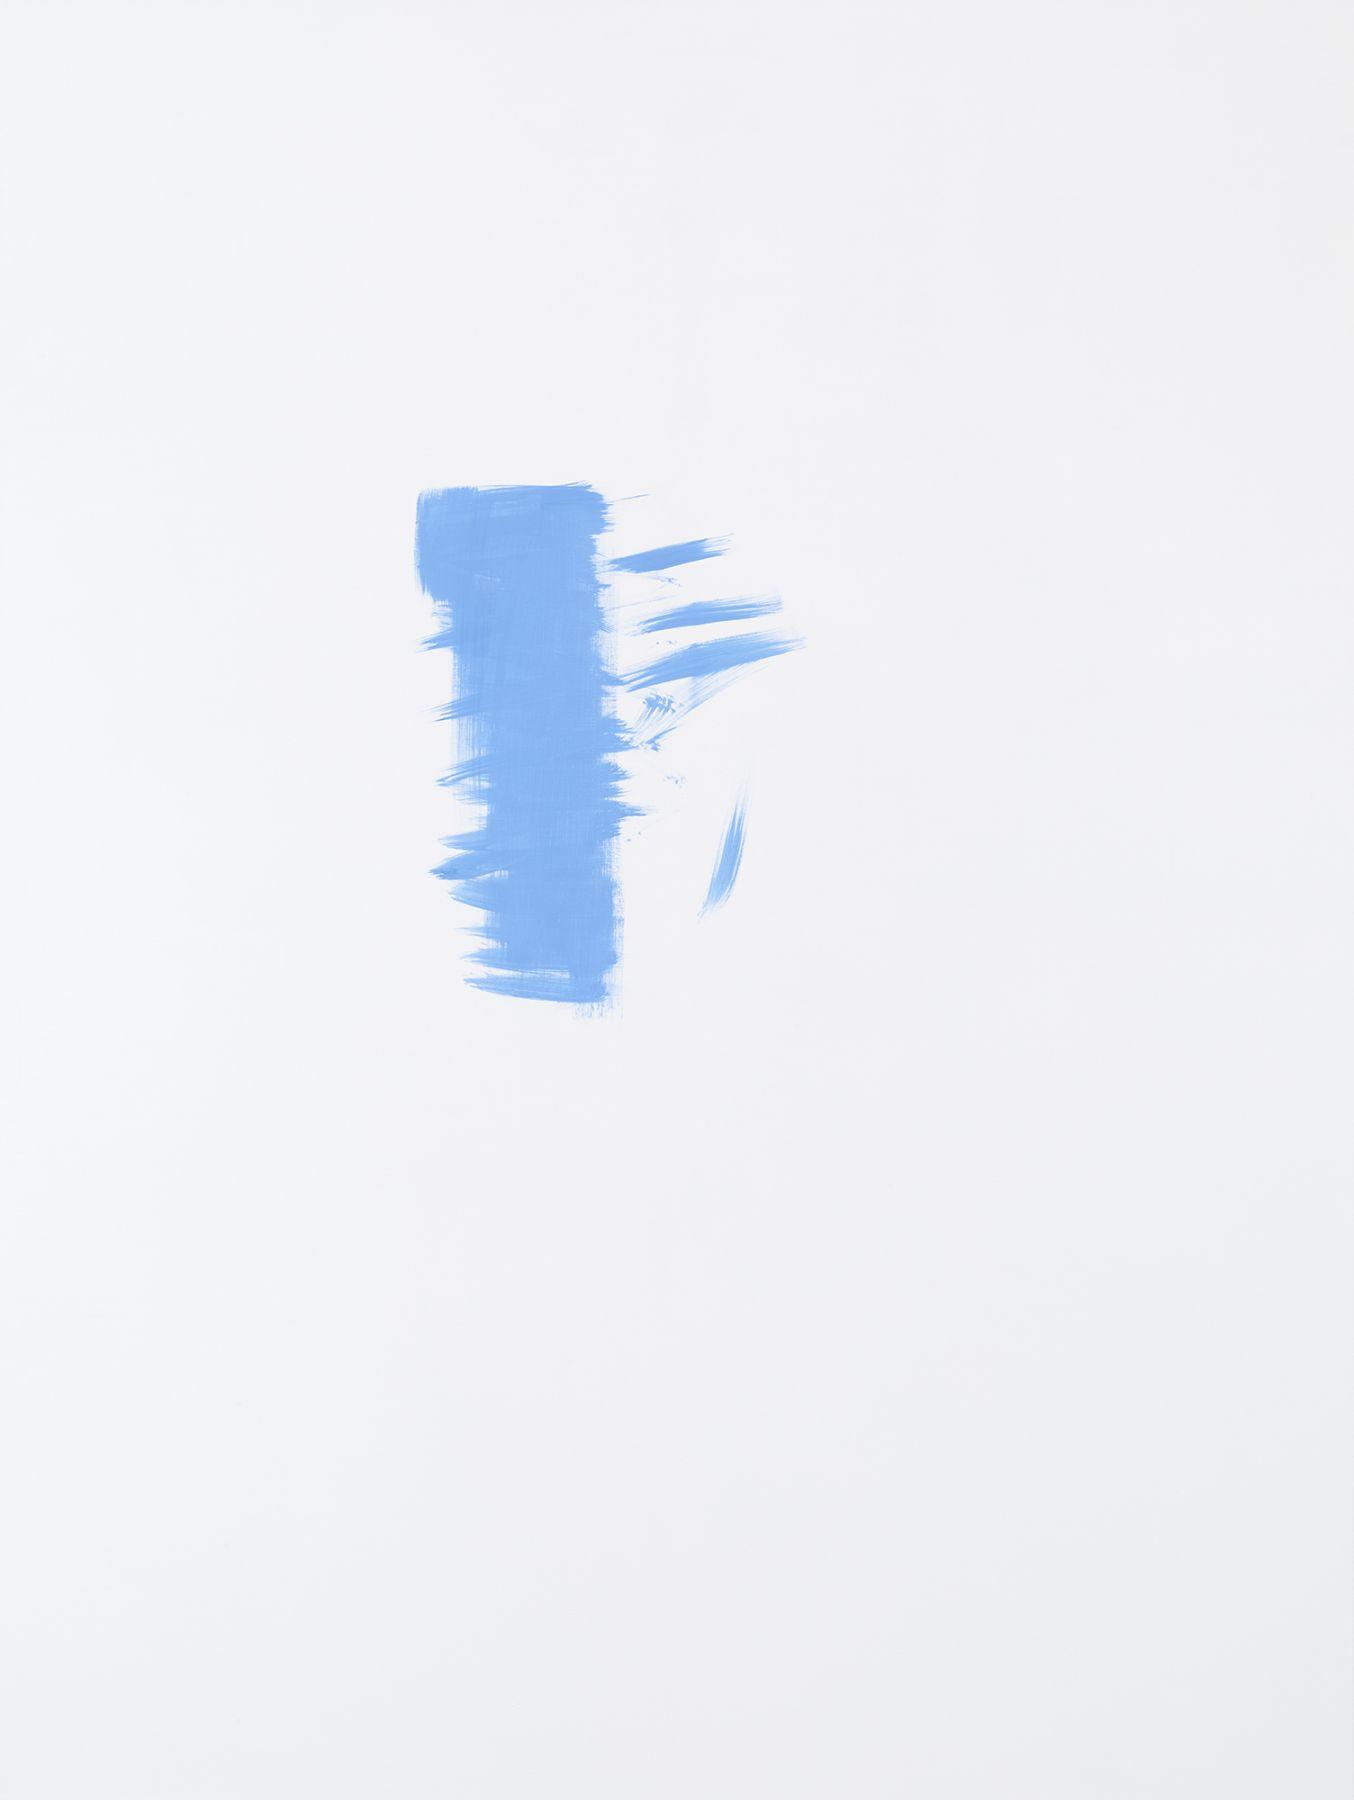 Michael Krebber MK.295, 2015 Acrylic on canvas 78 3/4 x 59 1/8 inches (200 x 150.2 cm)